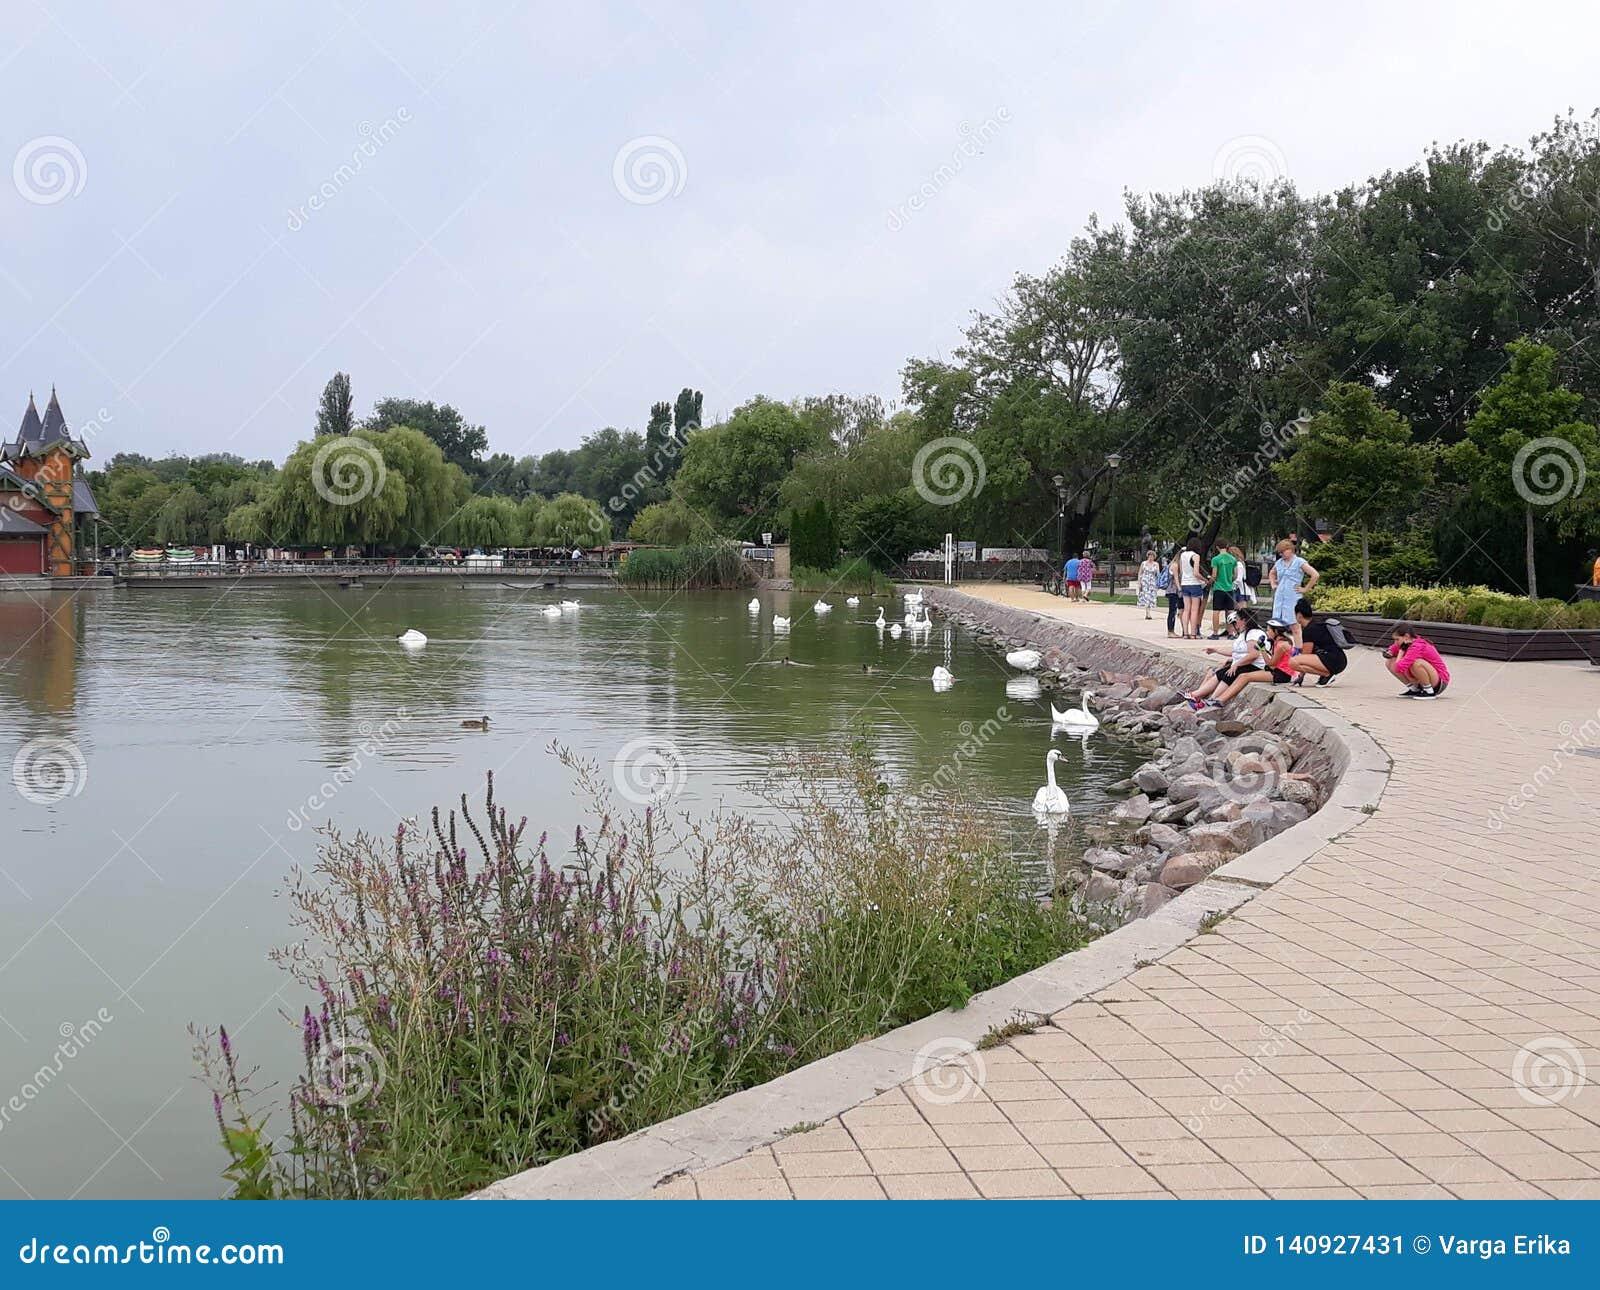 Balaton shore, peoples, water